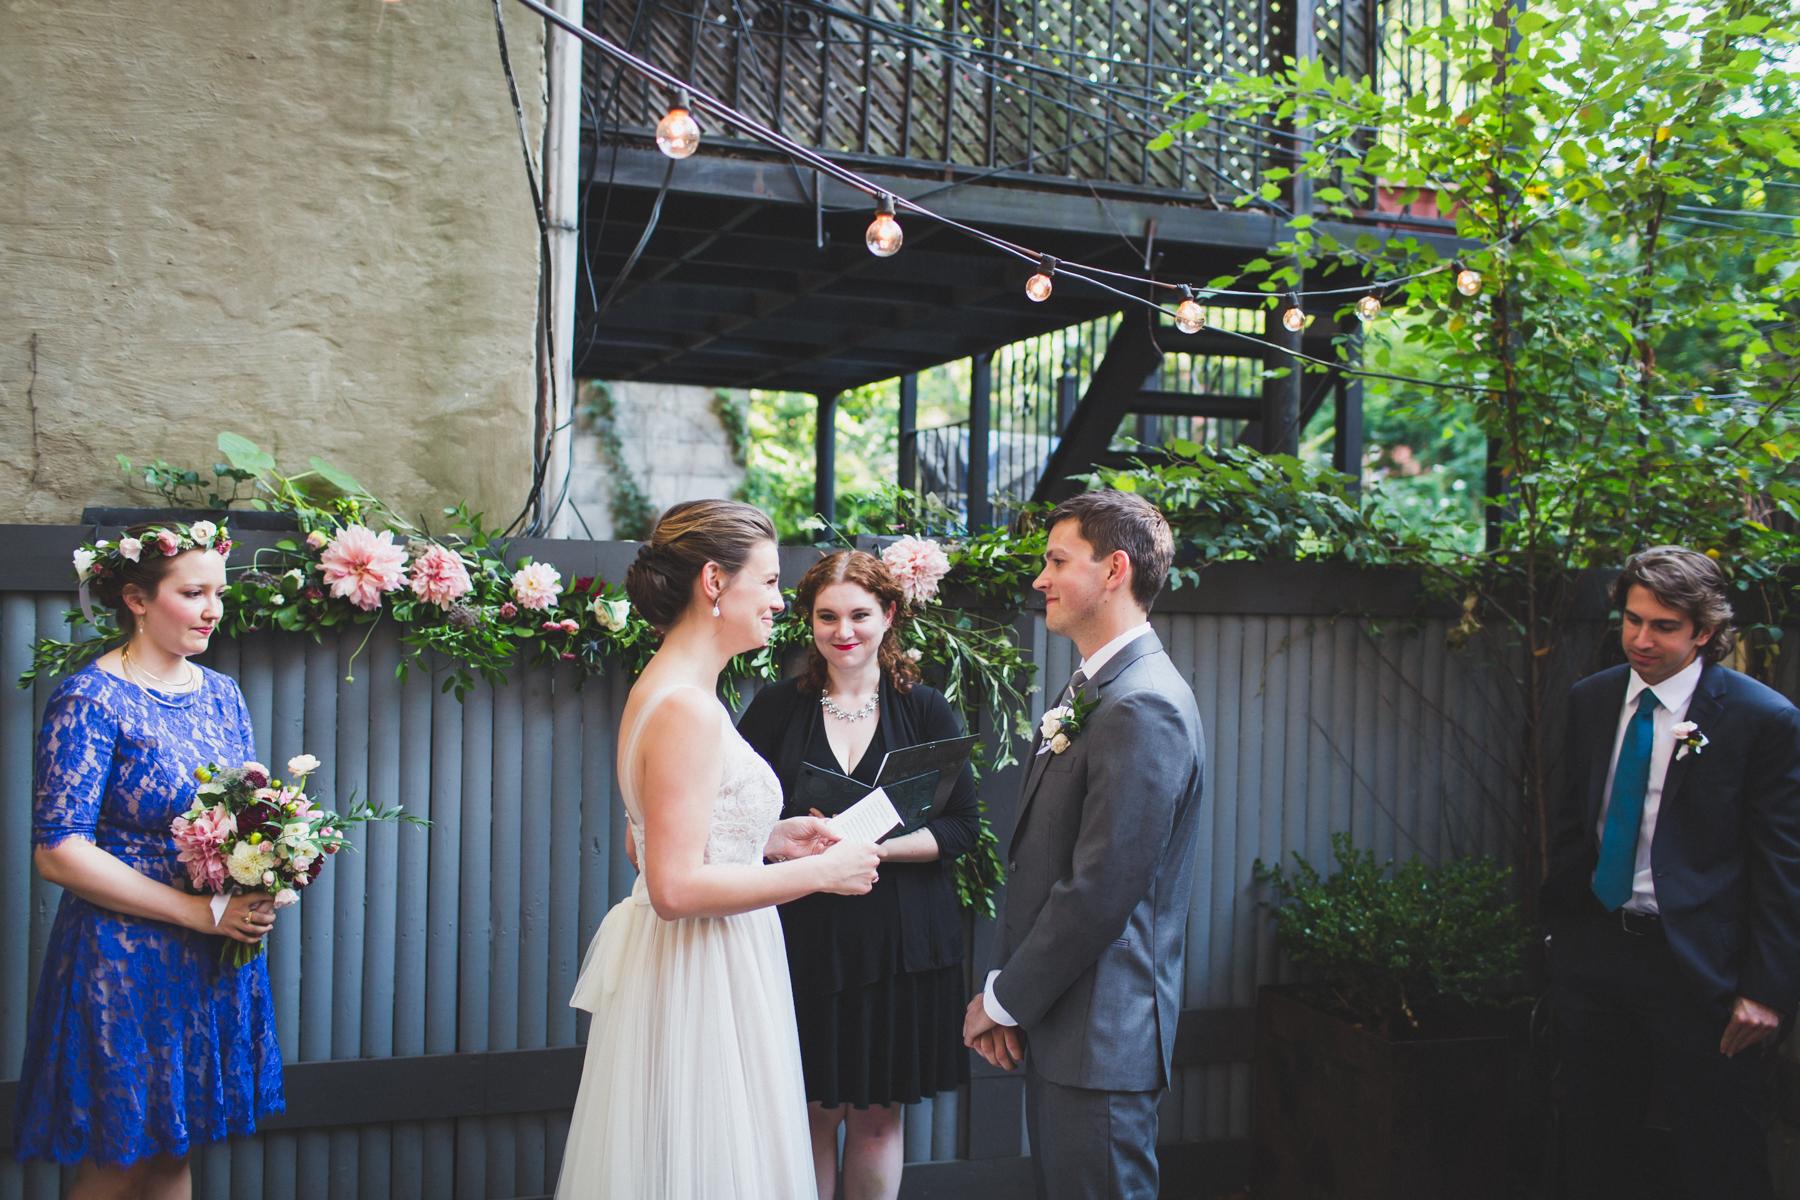 ICI-Restaurant-Fort-Greene-Brooklyn-Intimate-Documentary-Wedding-Photography-Elvira-Kalviste-38.jpg